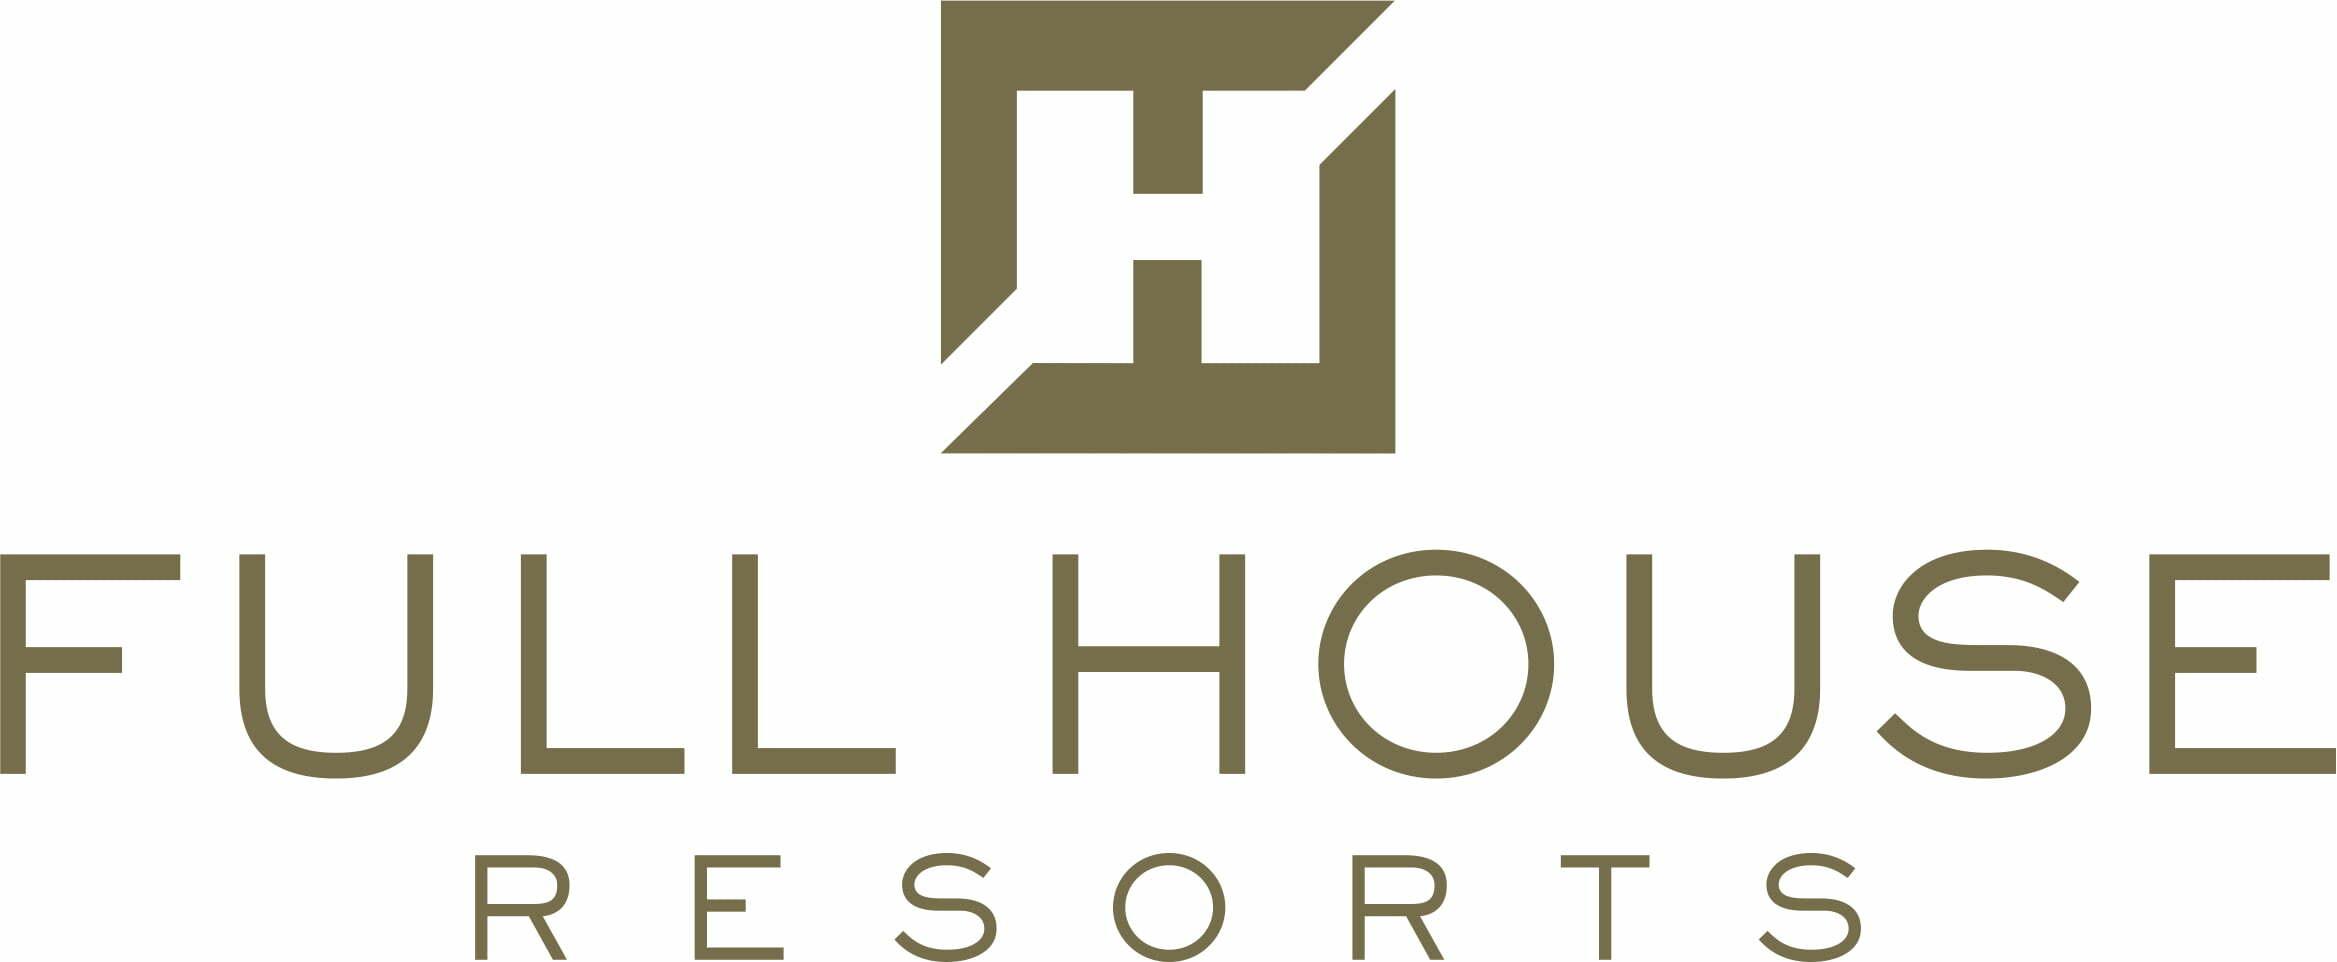 Full House Updates On Waukegan Casino Plan During Q3 Release